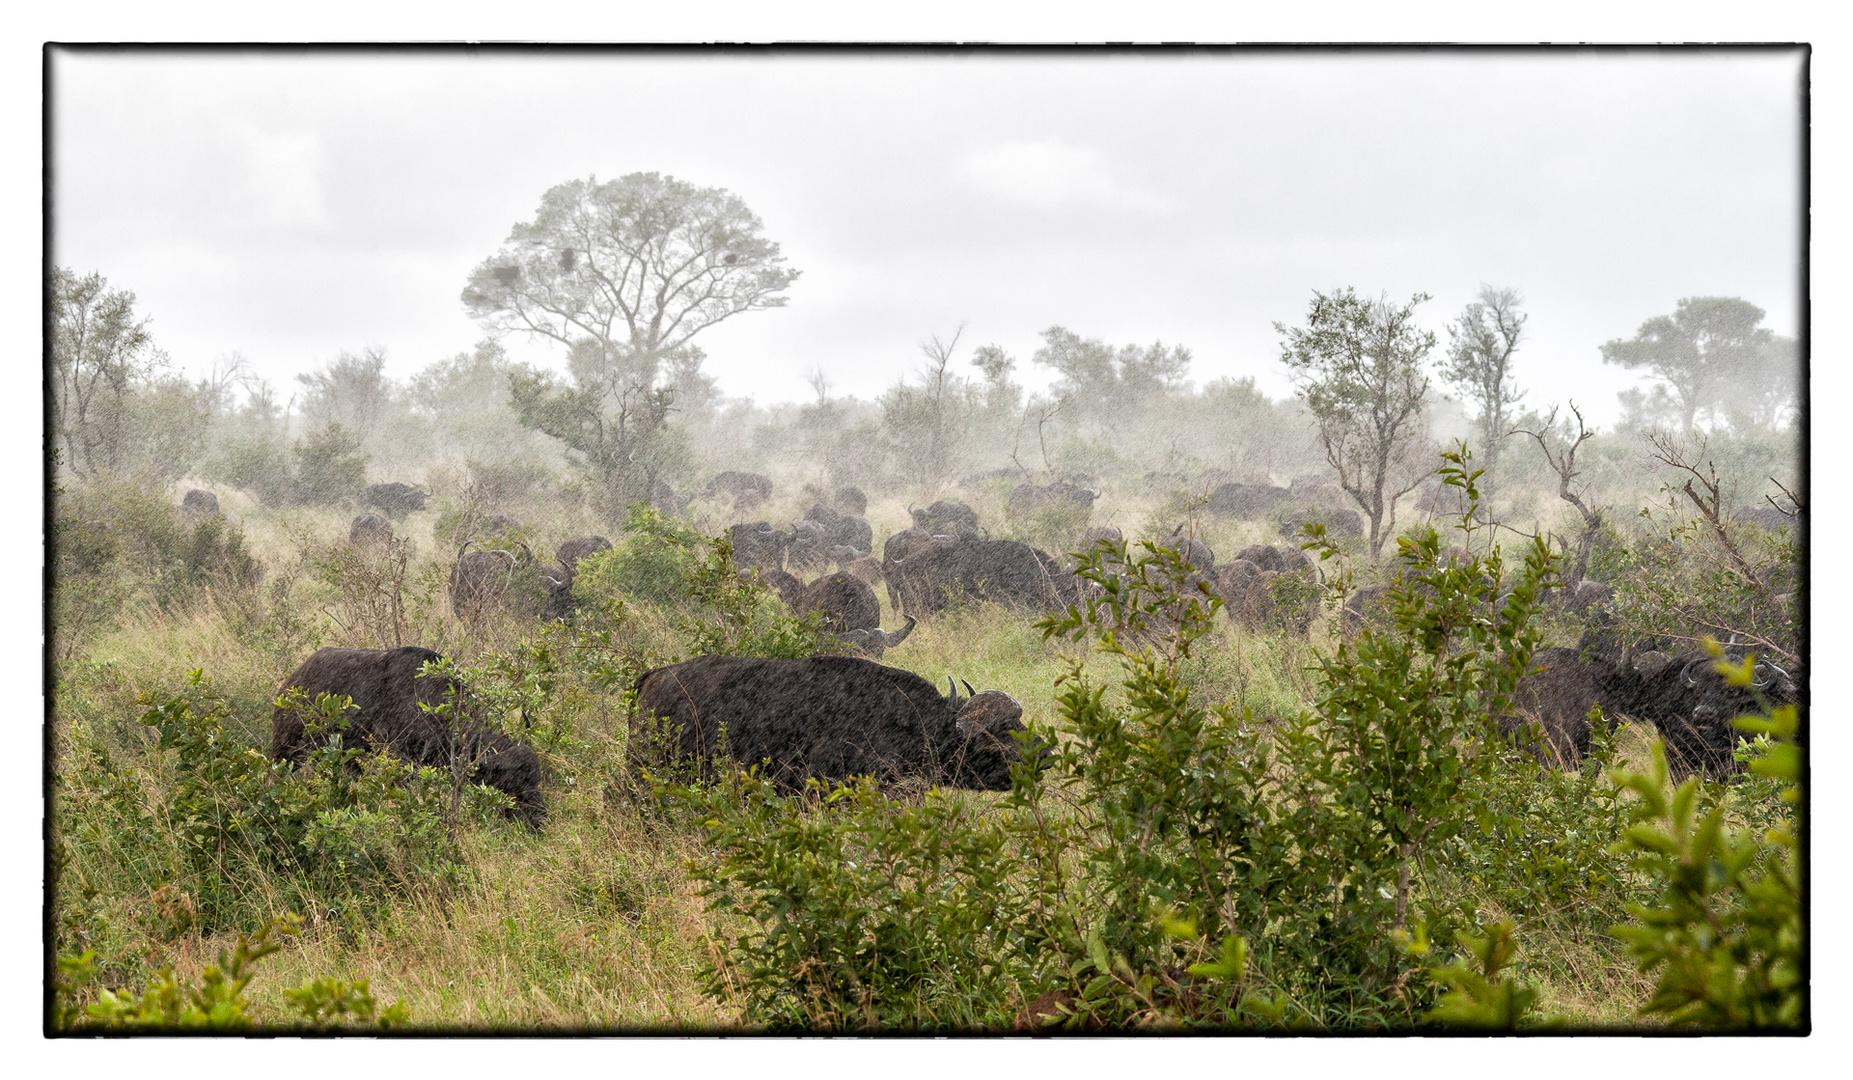 Wet Buffalo at Kruger